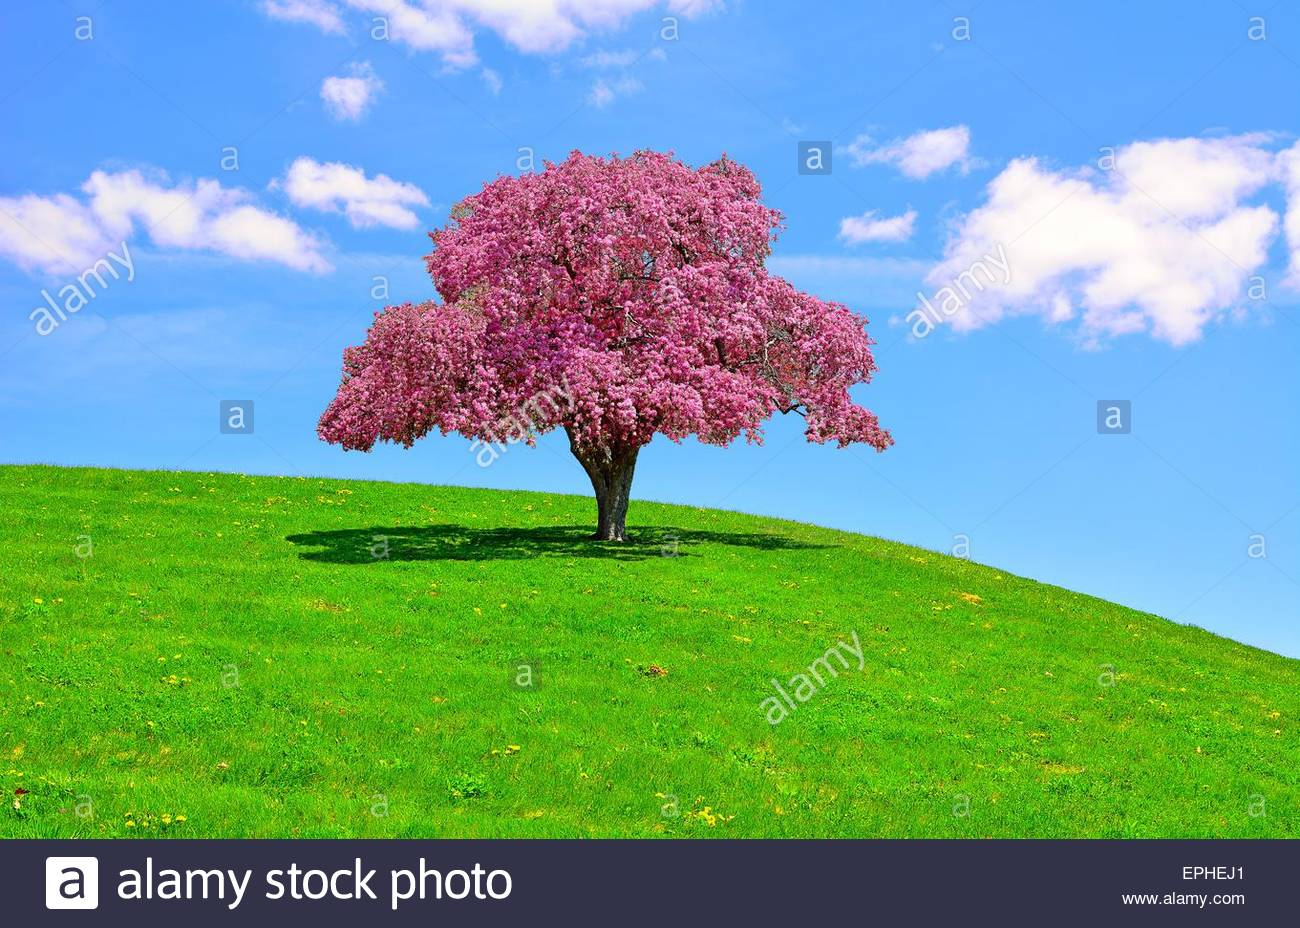 Pink puffy flowering tree stock photos pink puffy flowering tree a beautiful flowering pink crabapple tree on a lush hillside in eastern ohio stock mightylinksfo